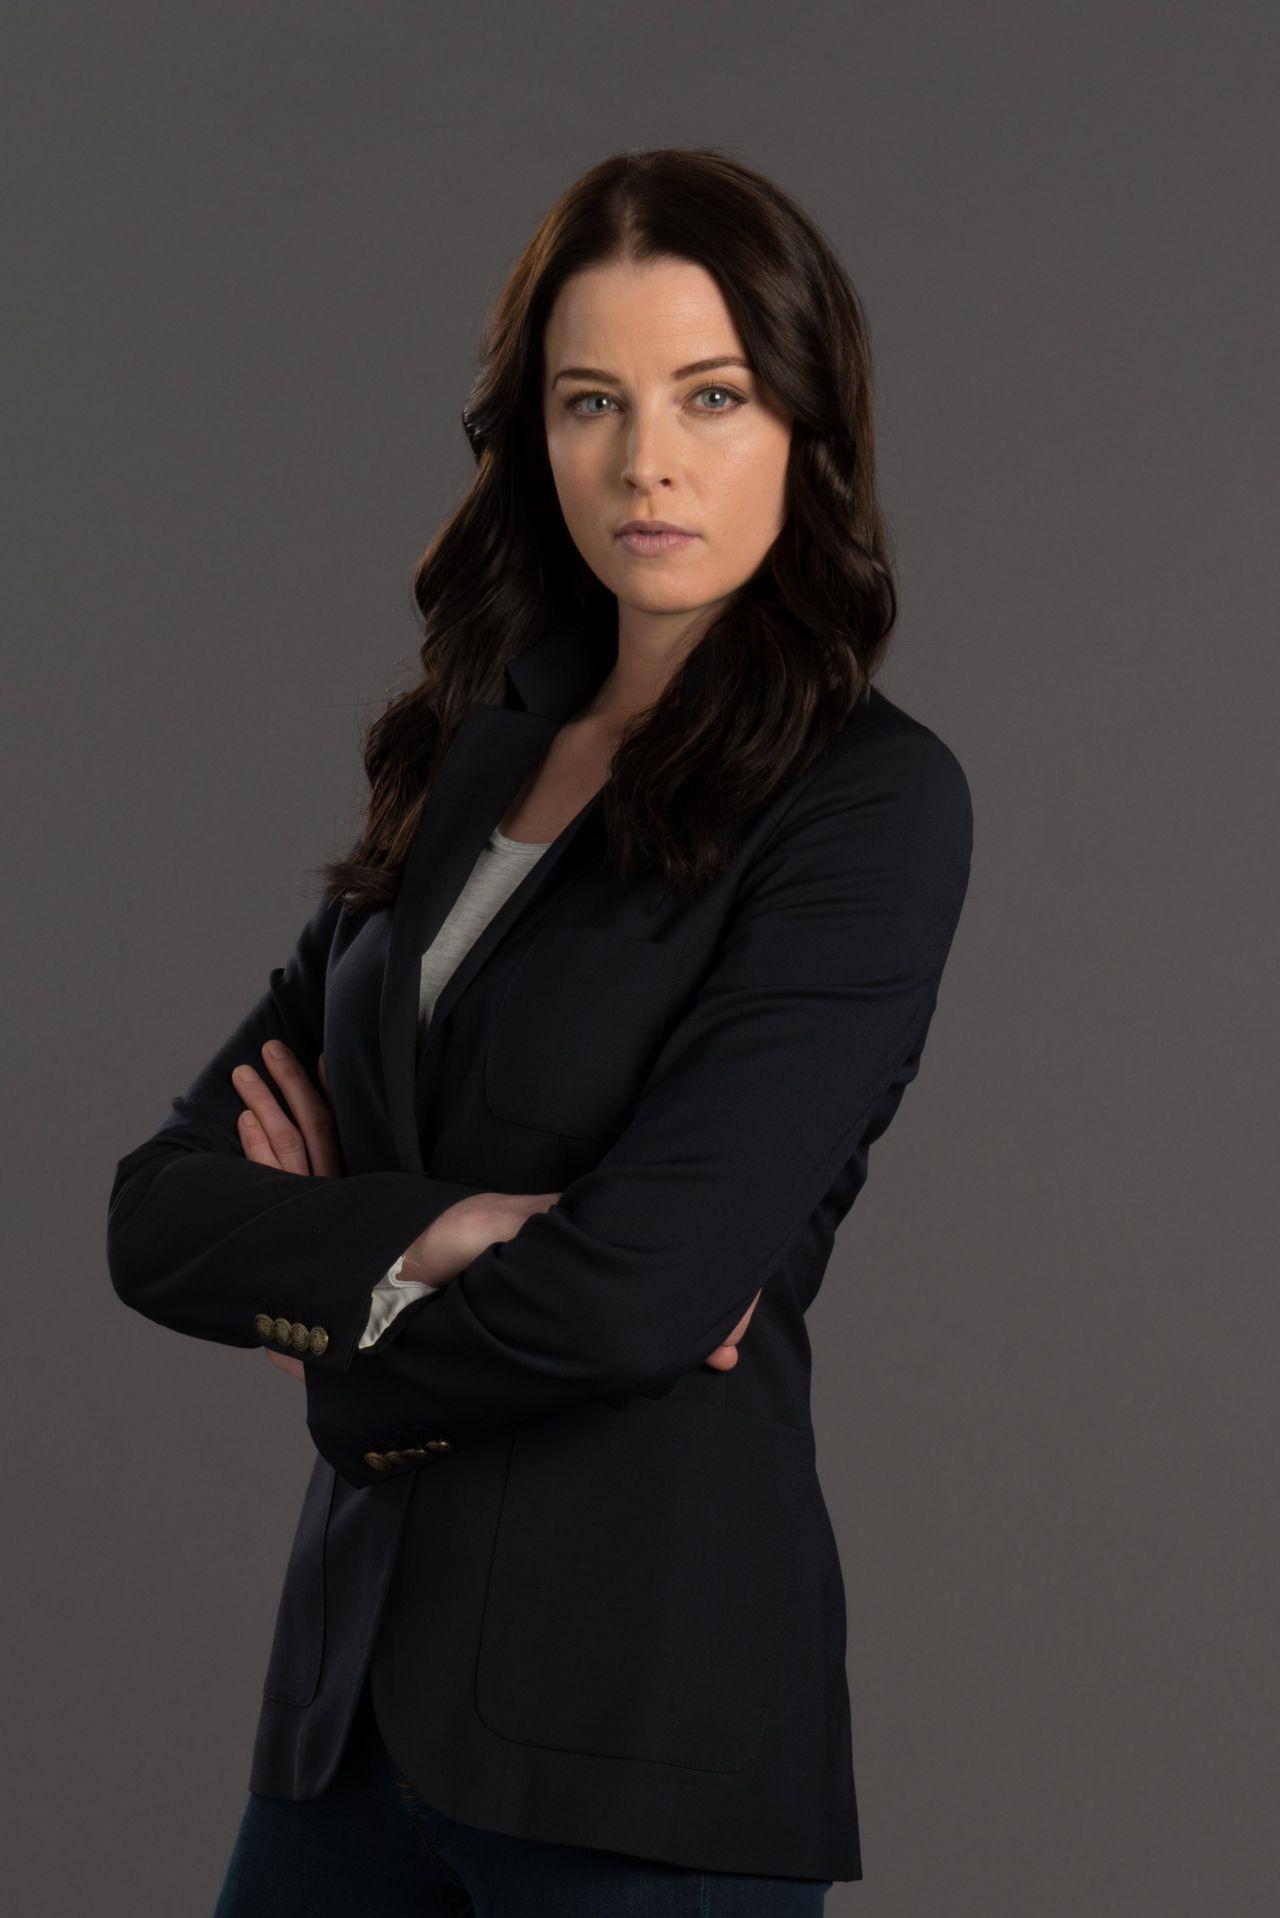 Rachel nichols continuum season 3